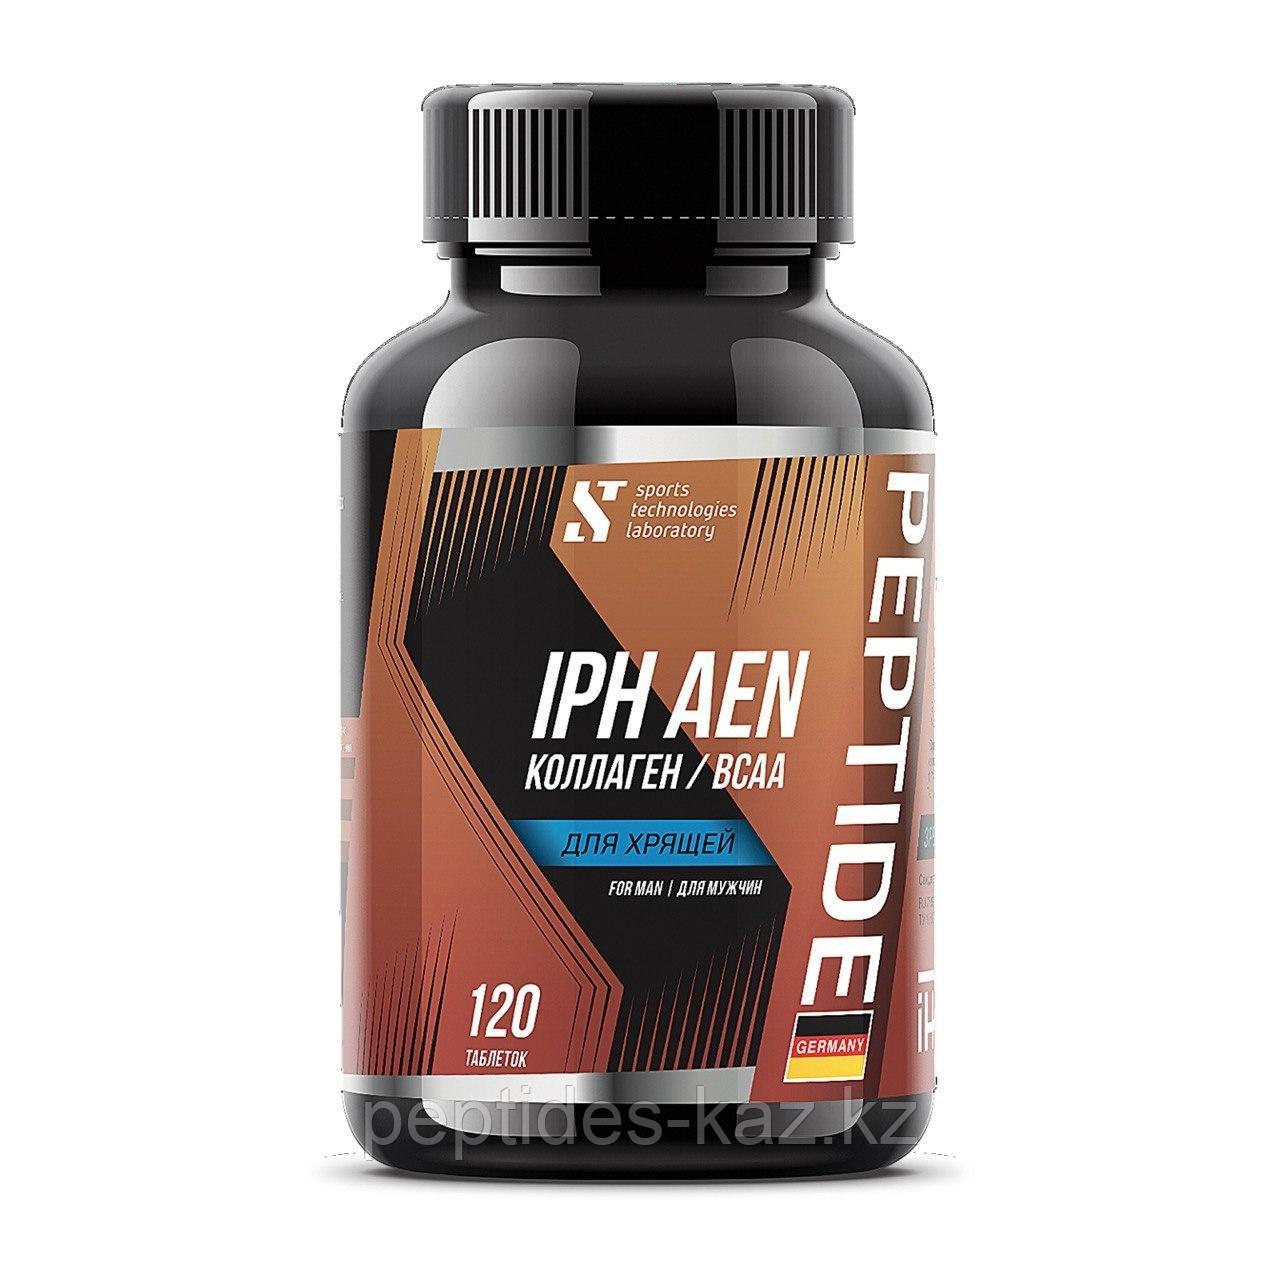 STL BCAA Collagen IPH® AEN с пептидами хрящей для мужчин